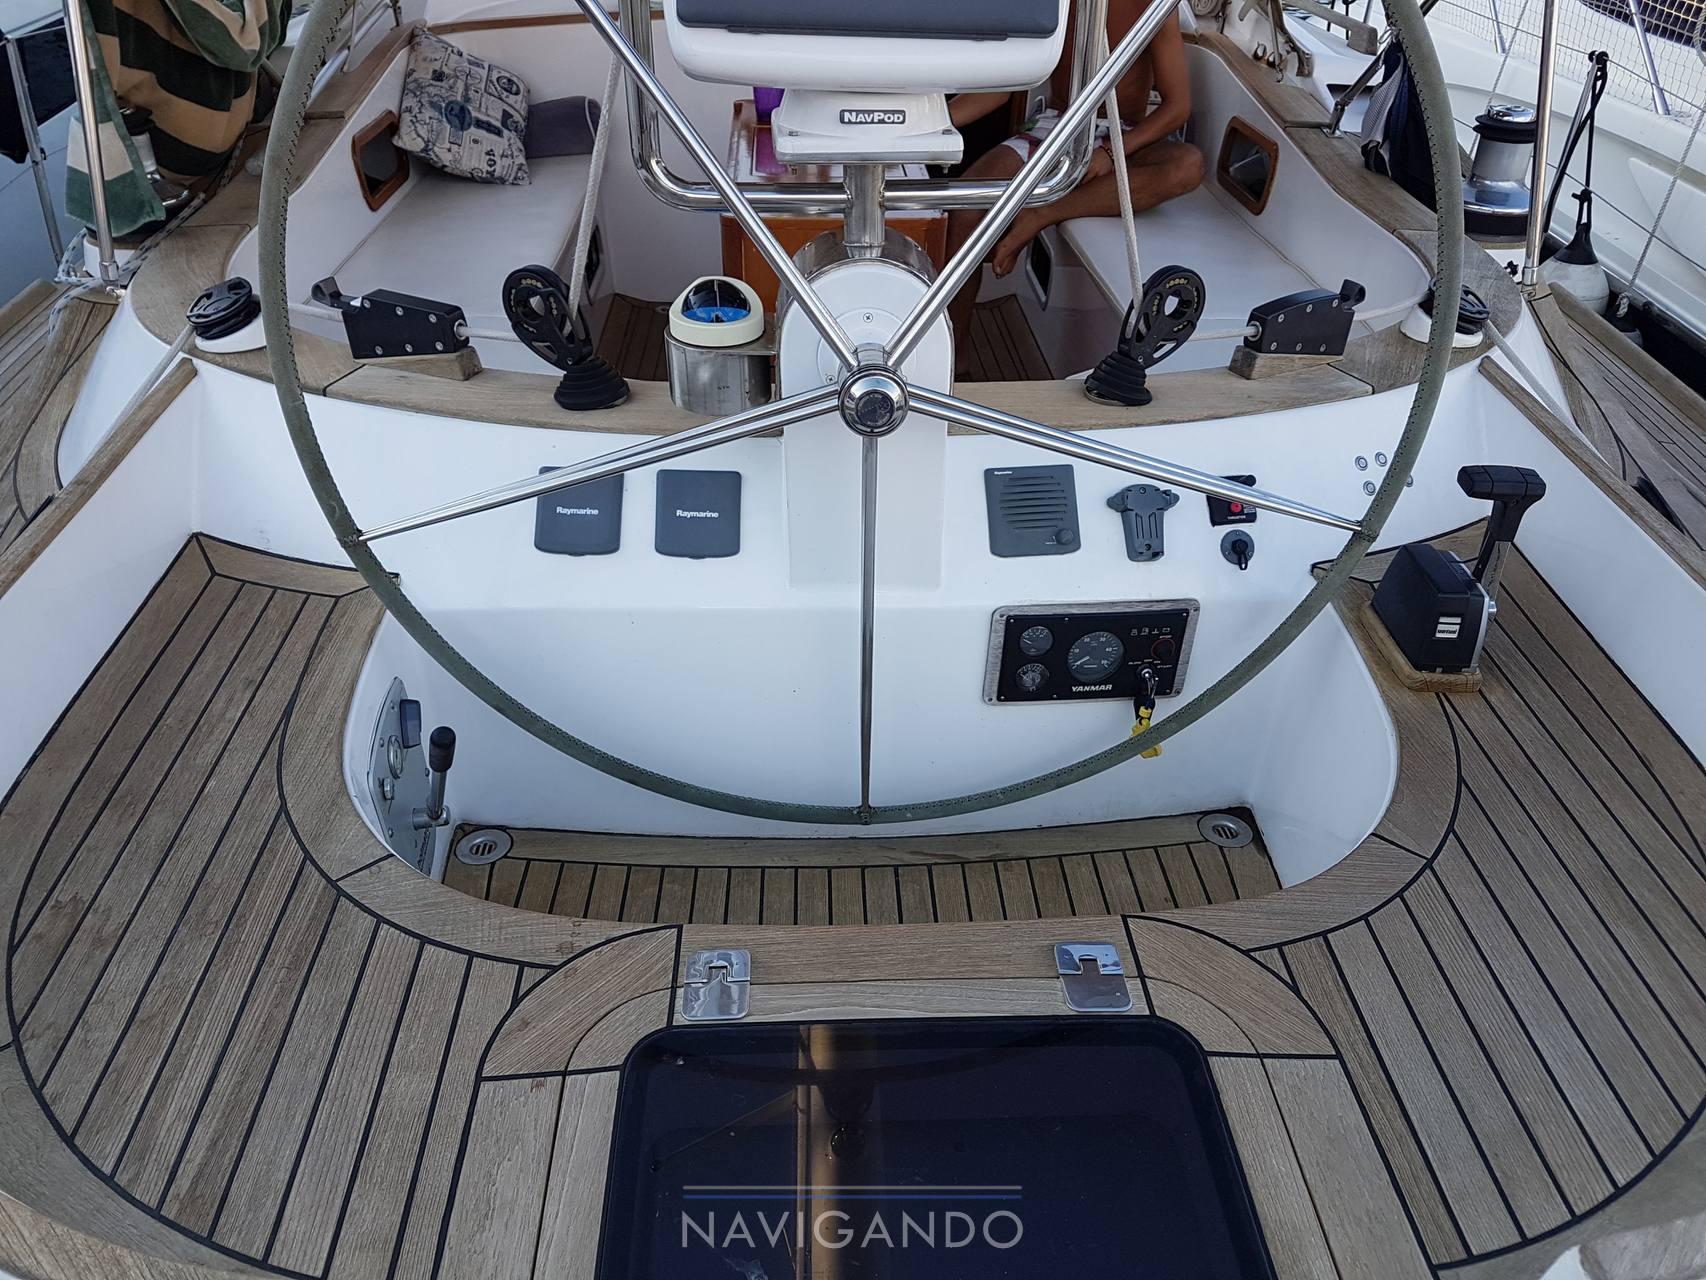 North wind 58 Sail cruiser used